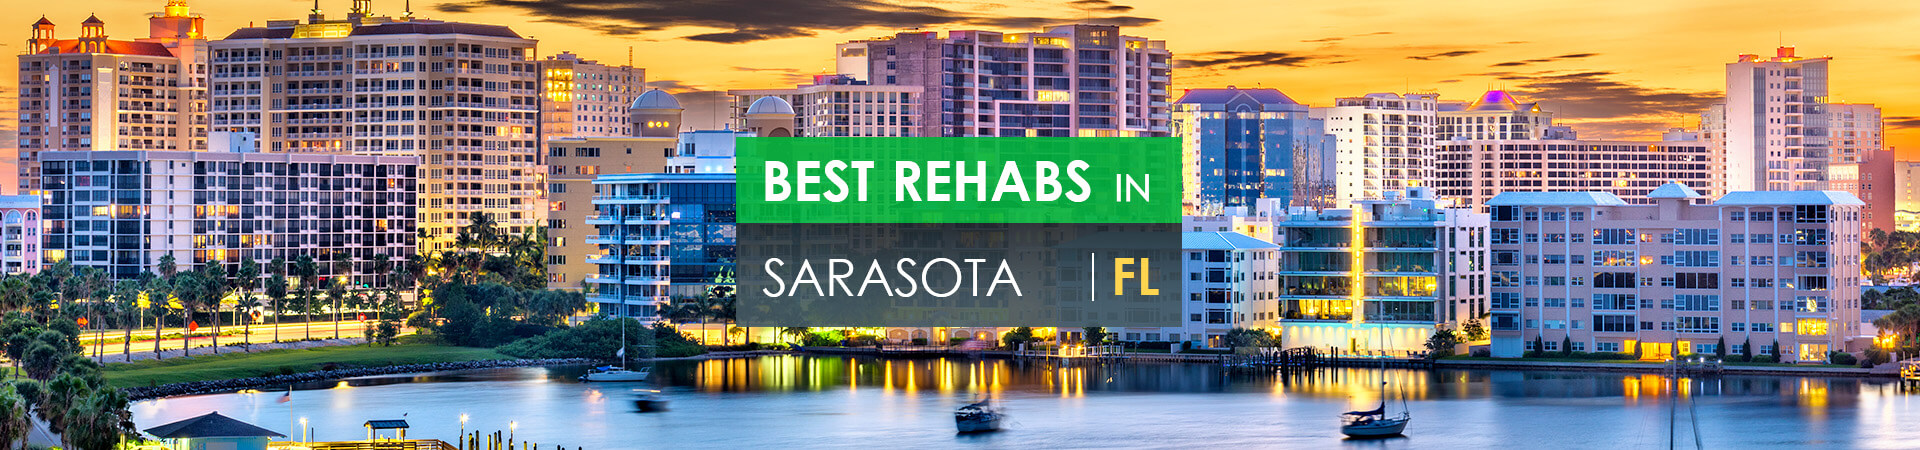 Best rehabs in Sarasota, FL